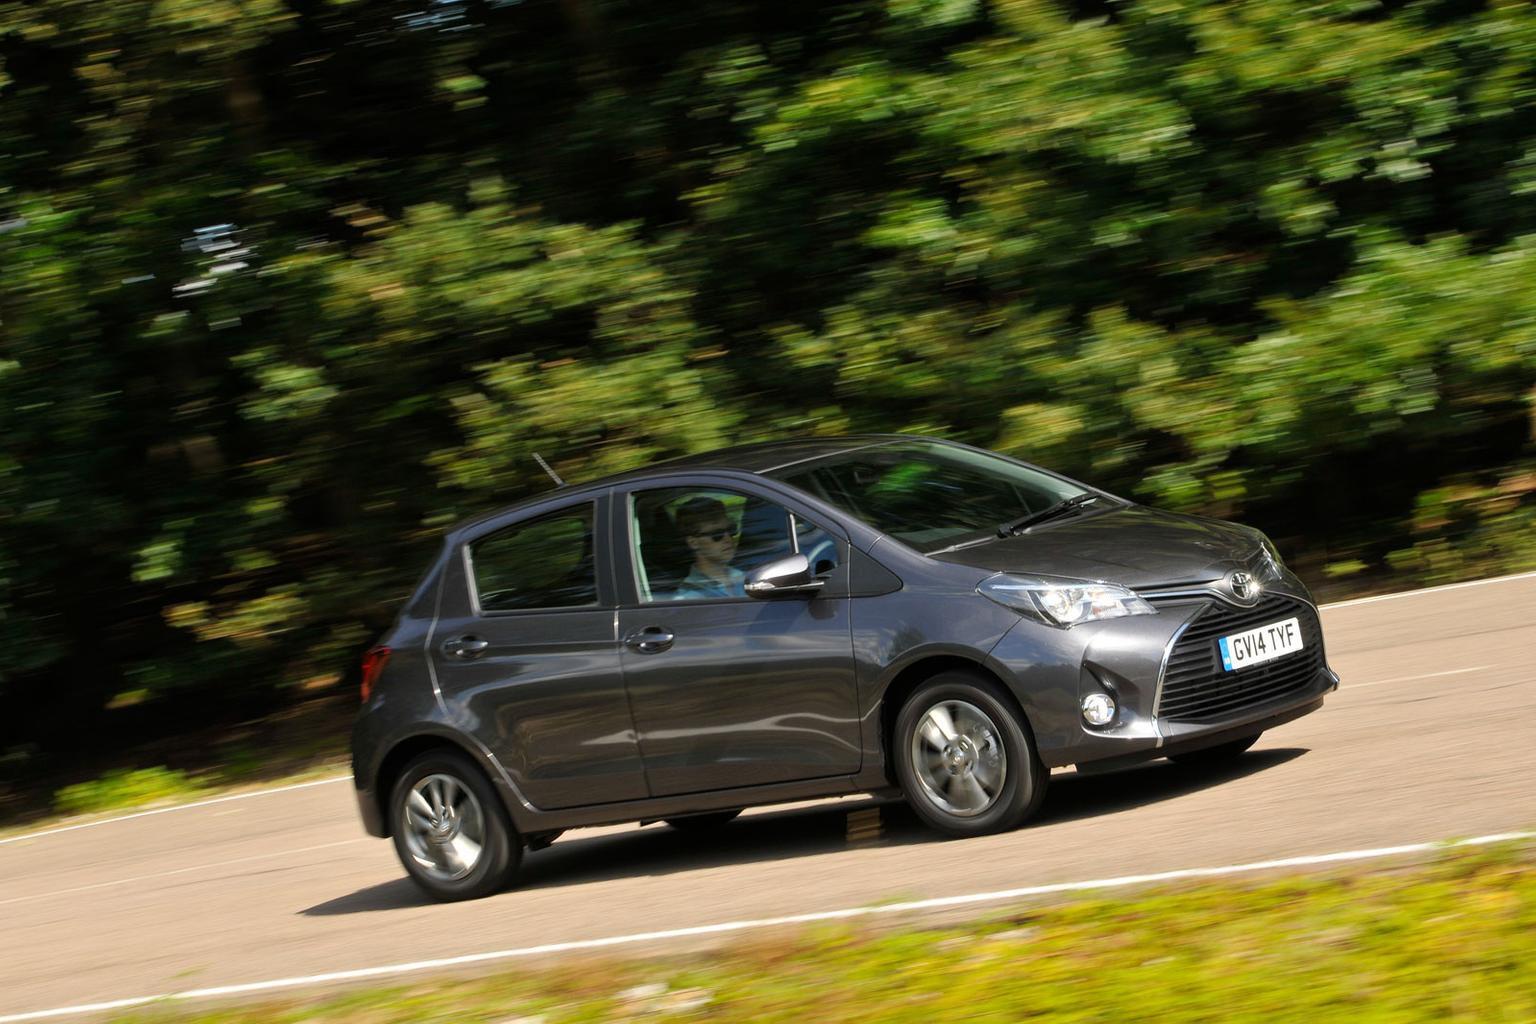 2014 Toyota Yaris 1.33 review